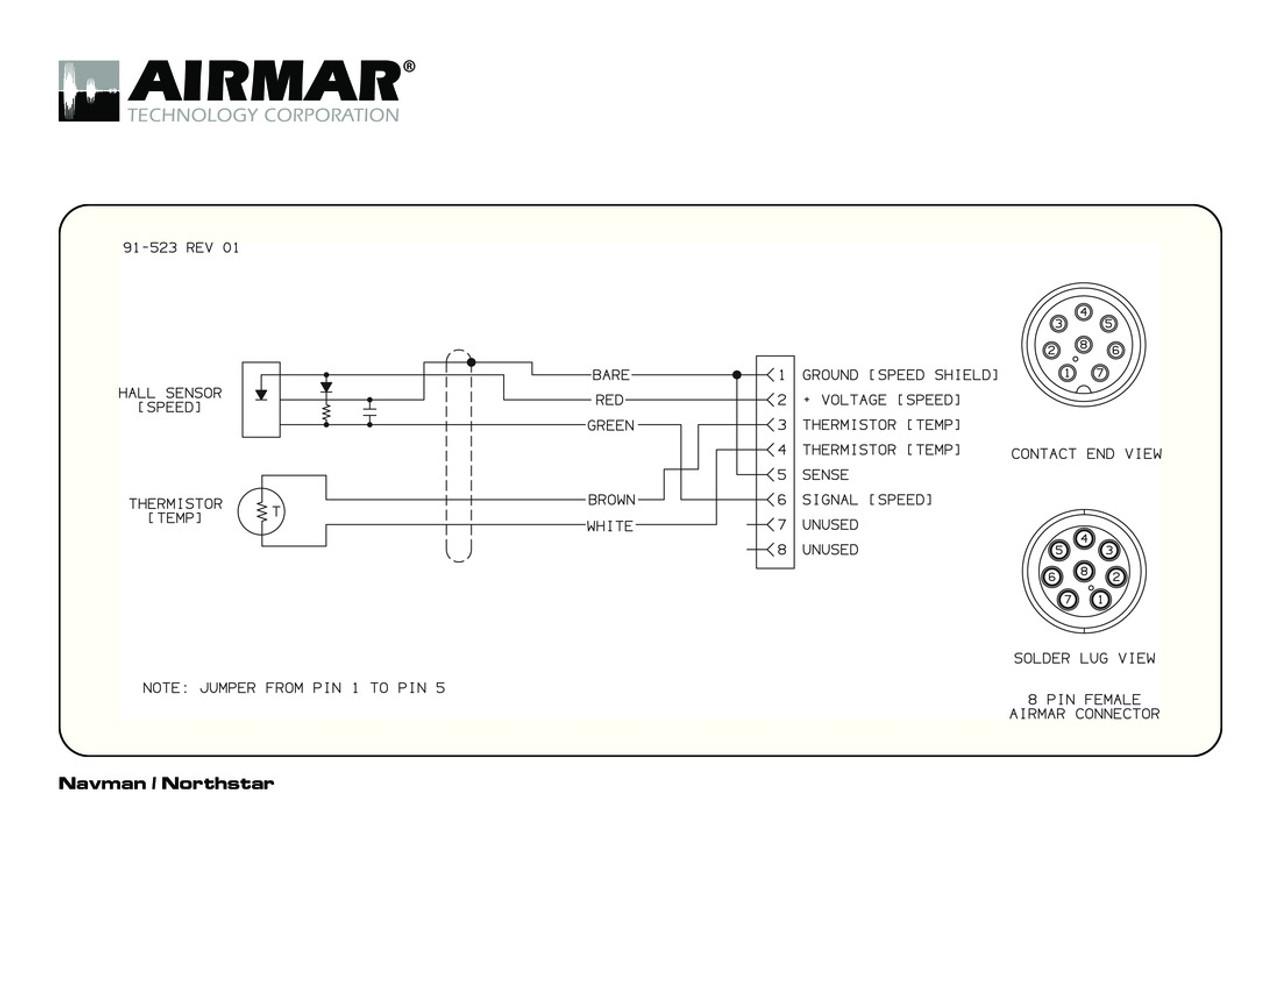 Peachy Shadow Cruiser Wiring Diagram Online Wiring Diagram Wiring Digital Resources Zidurslowmaporg